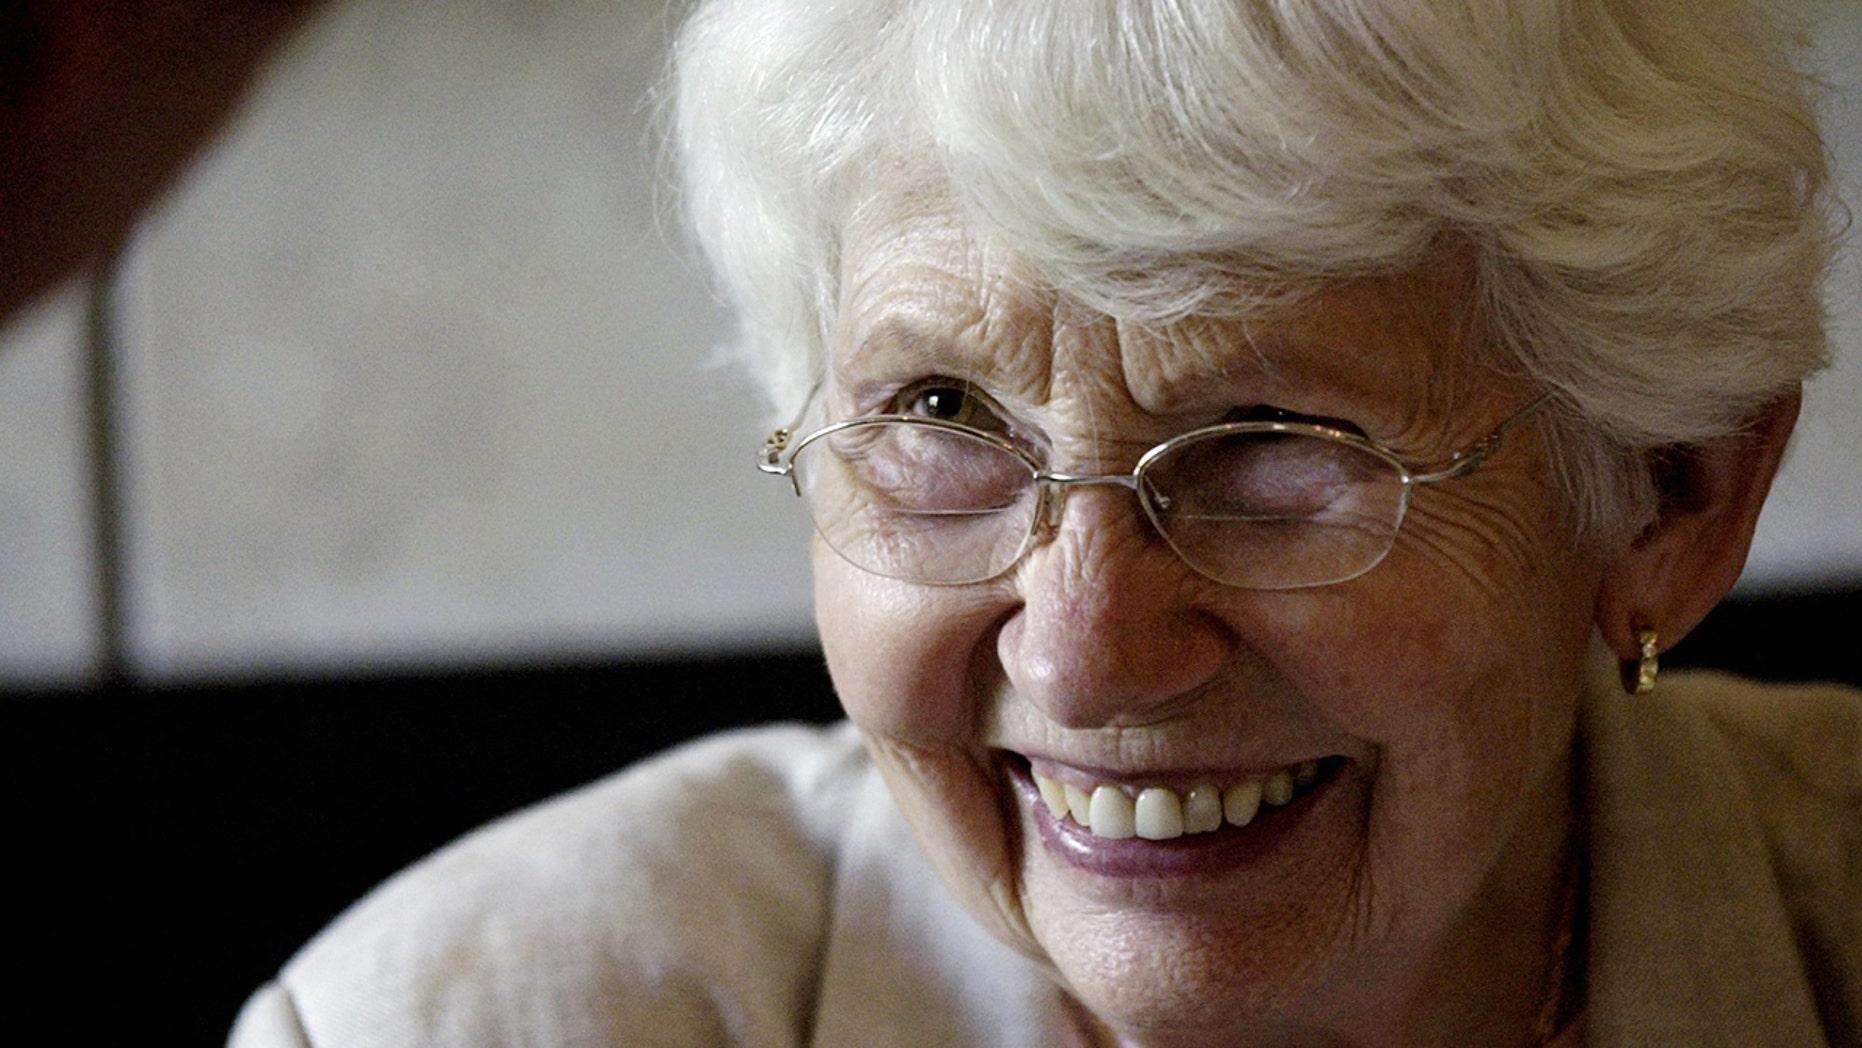 David Letterman's mom, Dorothy Mengering, died Tuesday, April 11, 2017, Letterman's publicist Tom Keaney confirmed. She was 95.